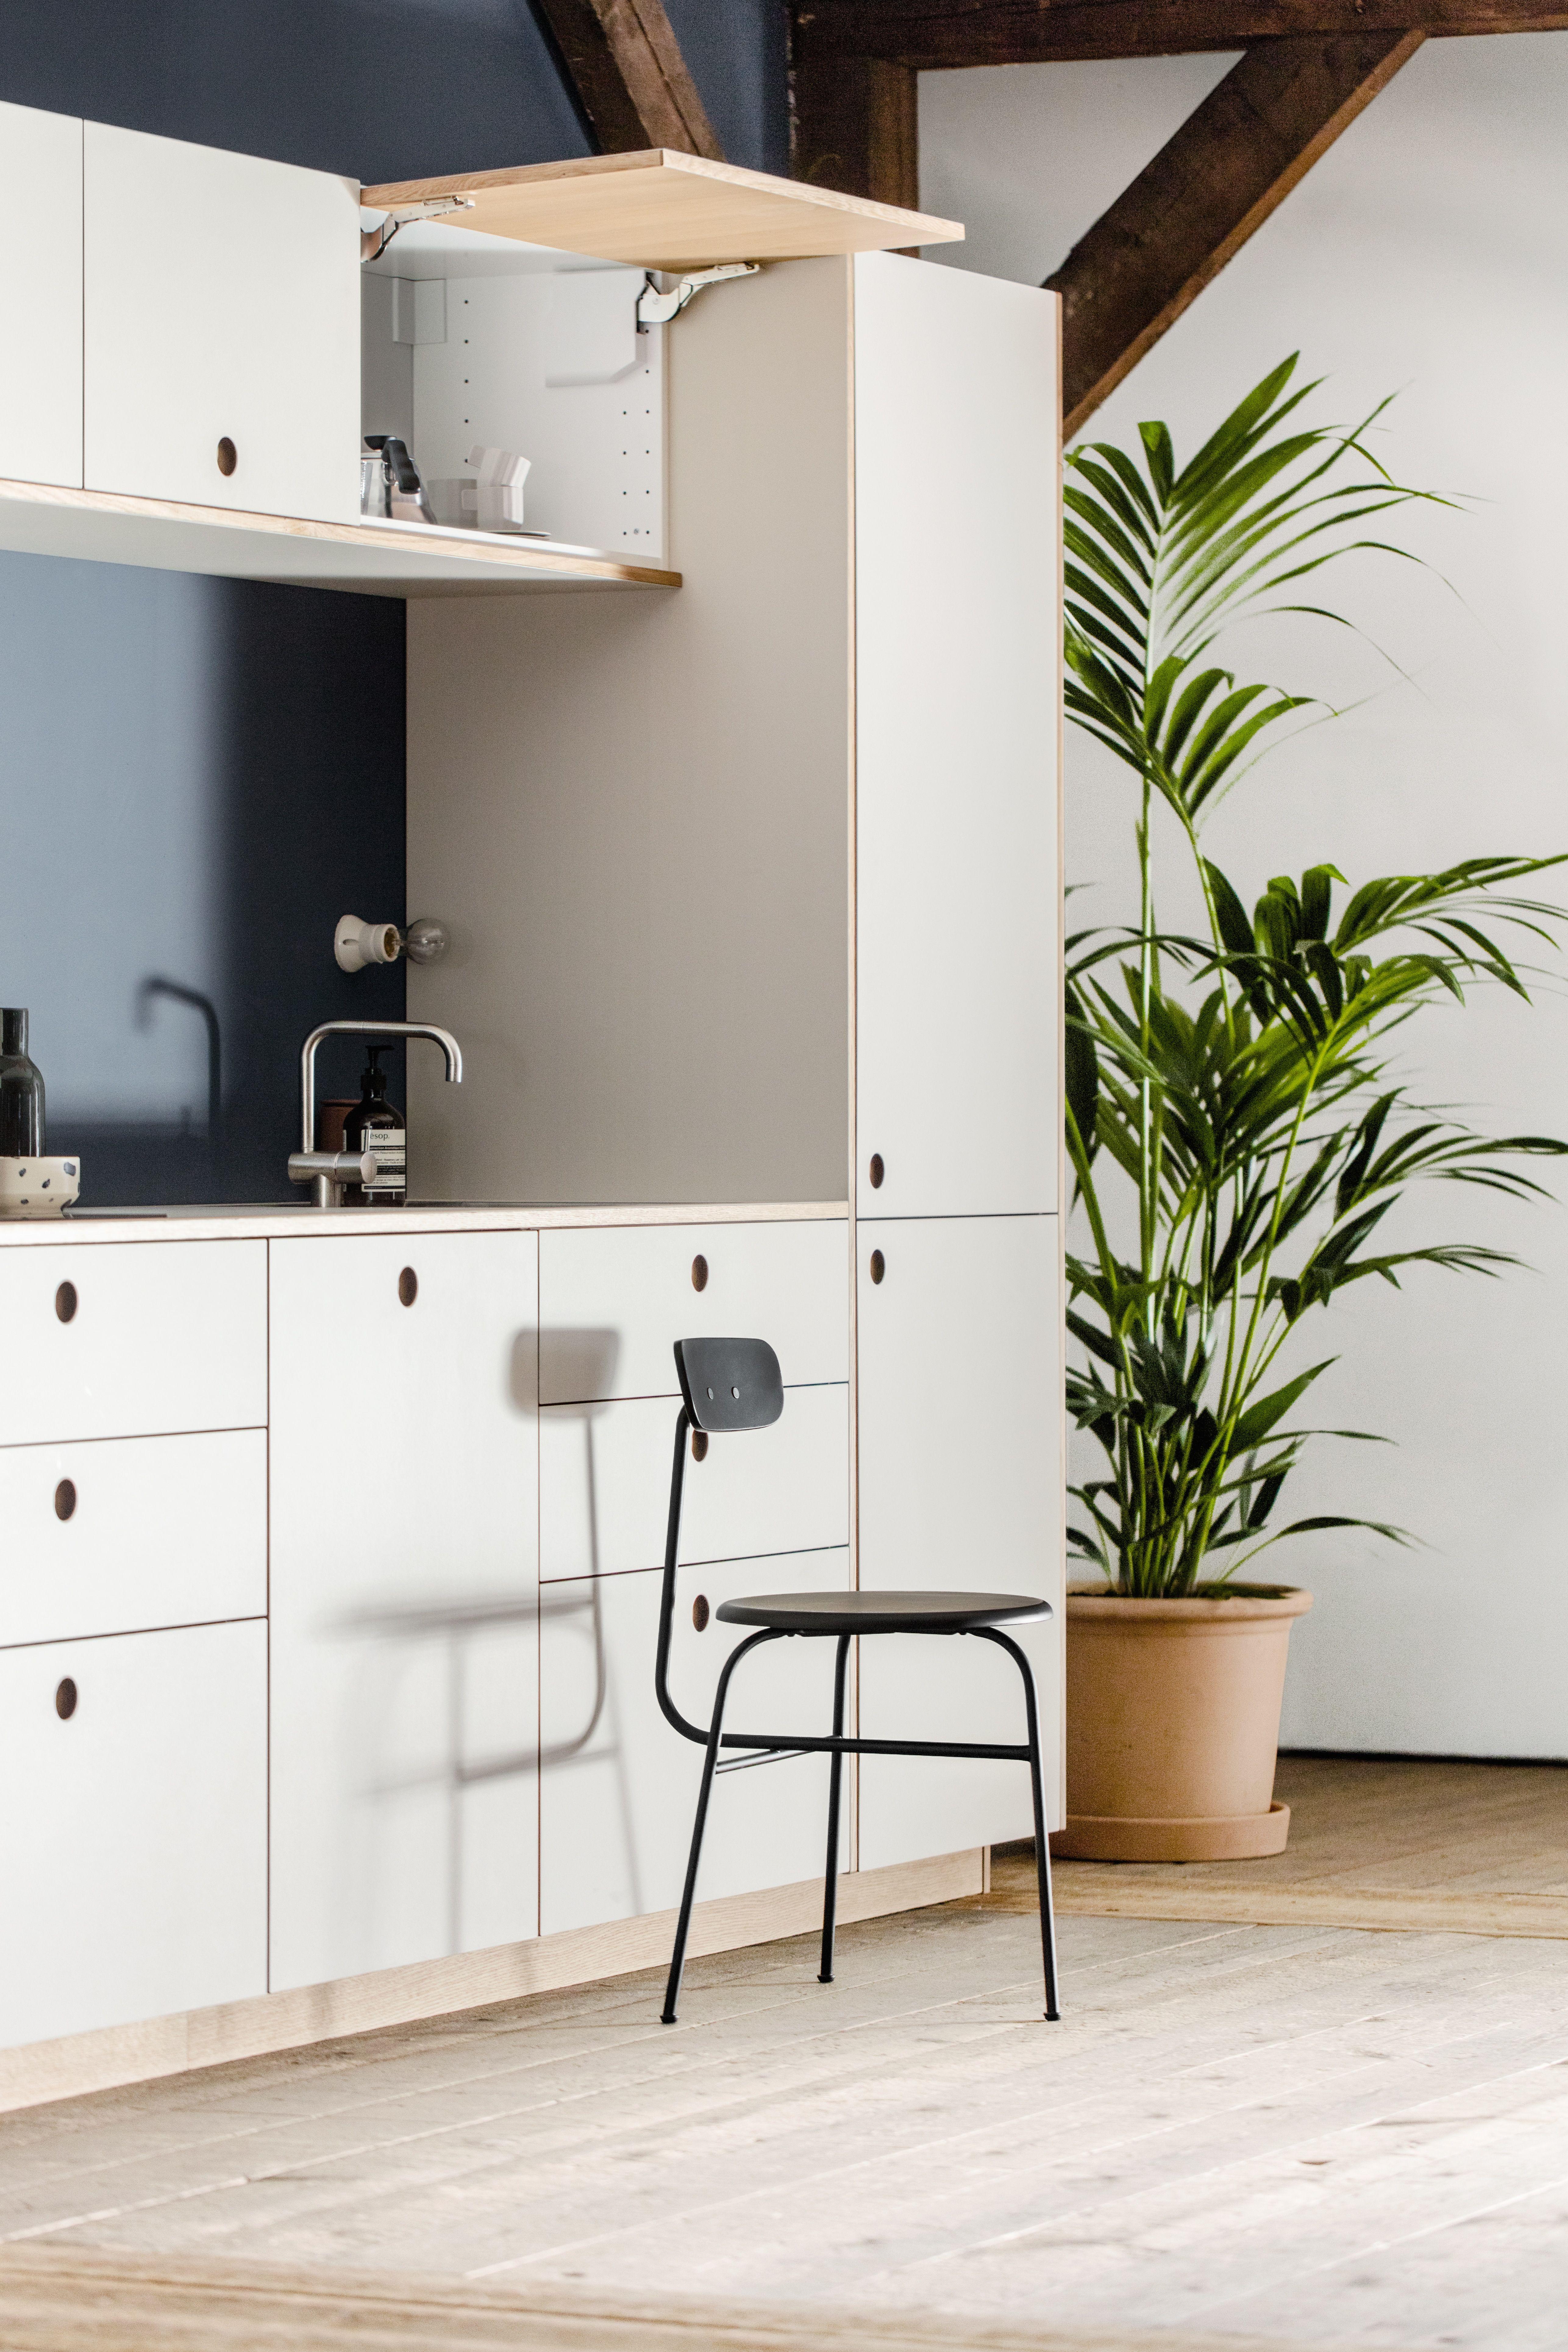 grifflose k che profile k che kaufen viersen. Black Bedroom Furniture Sets. Home Design Ideas